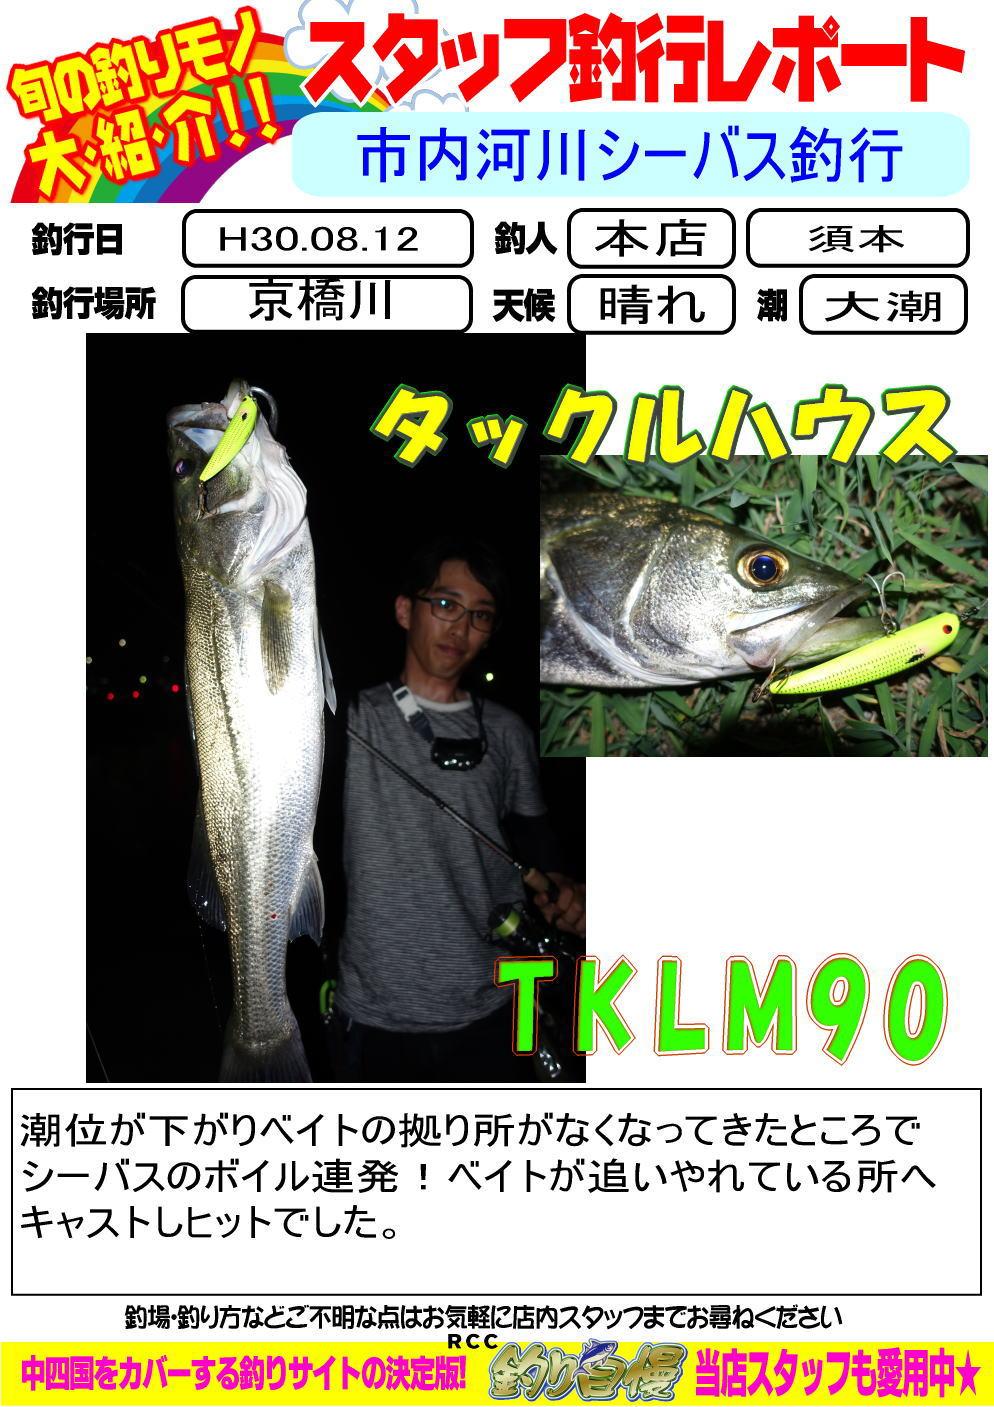 http://www.e-angle.co.jp/shop/blog/H30.08.12.jpg